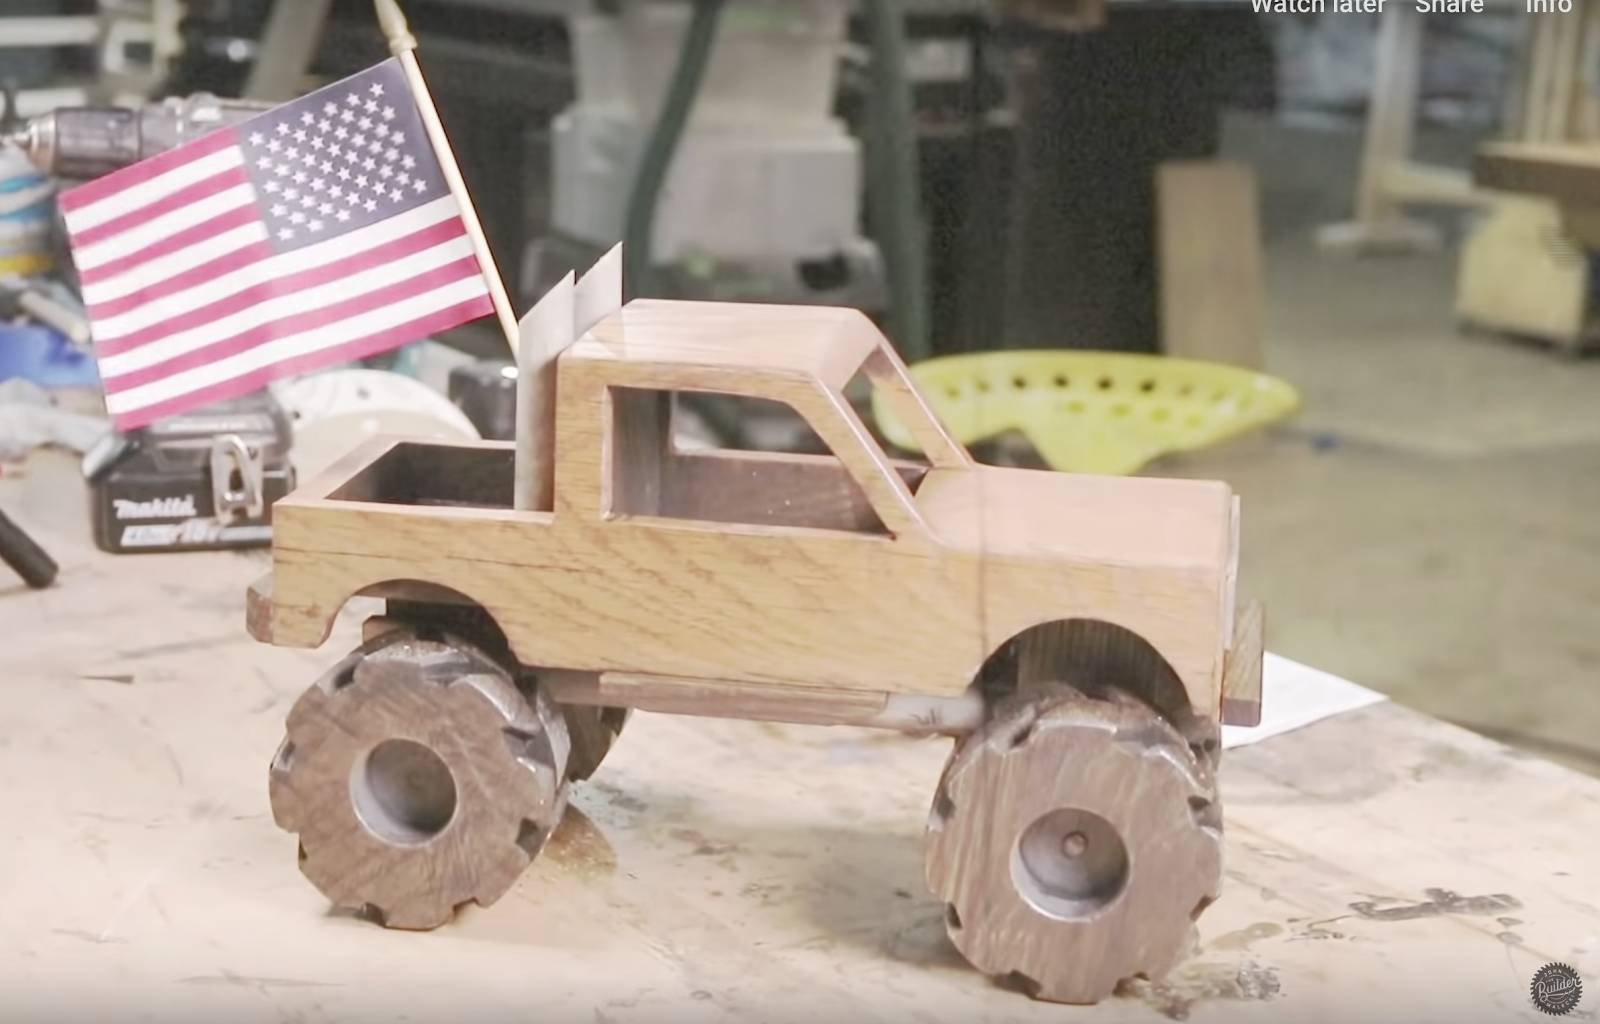 John malecki's DIY wooden toy truck